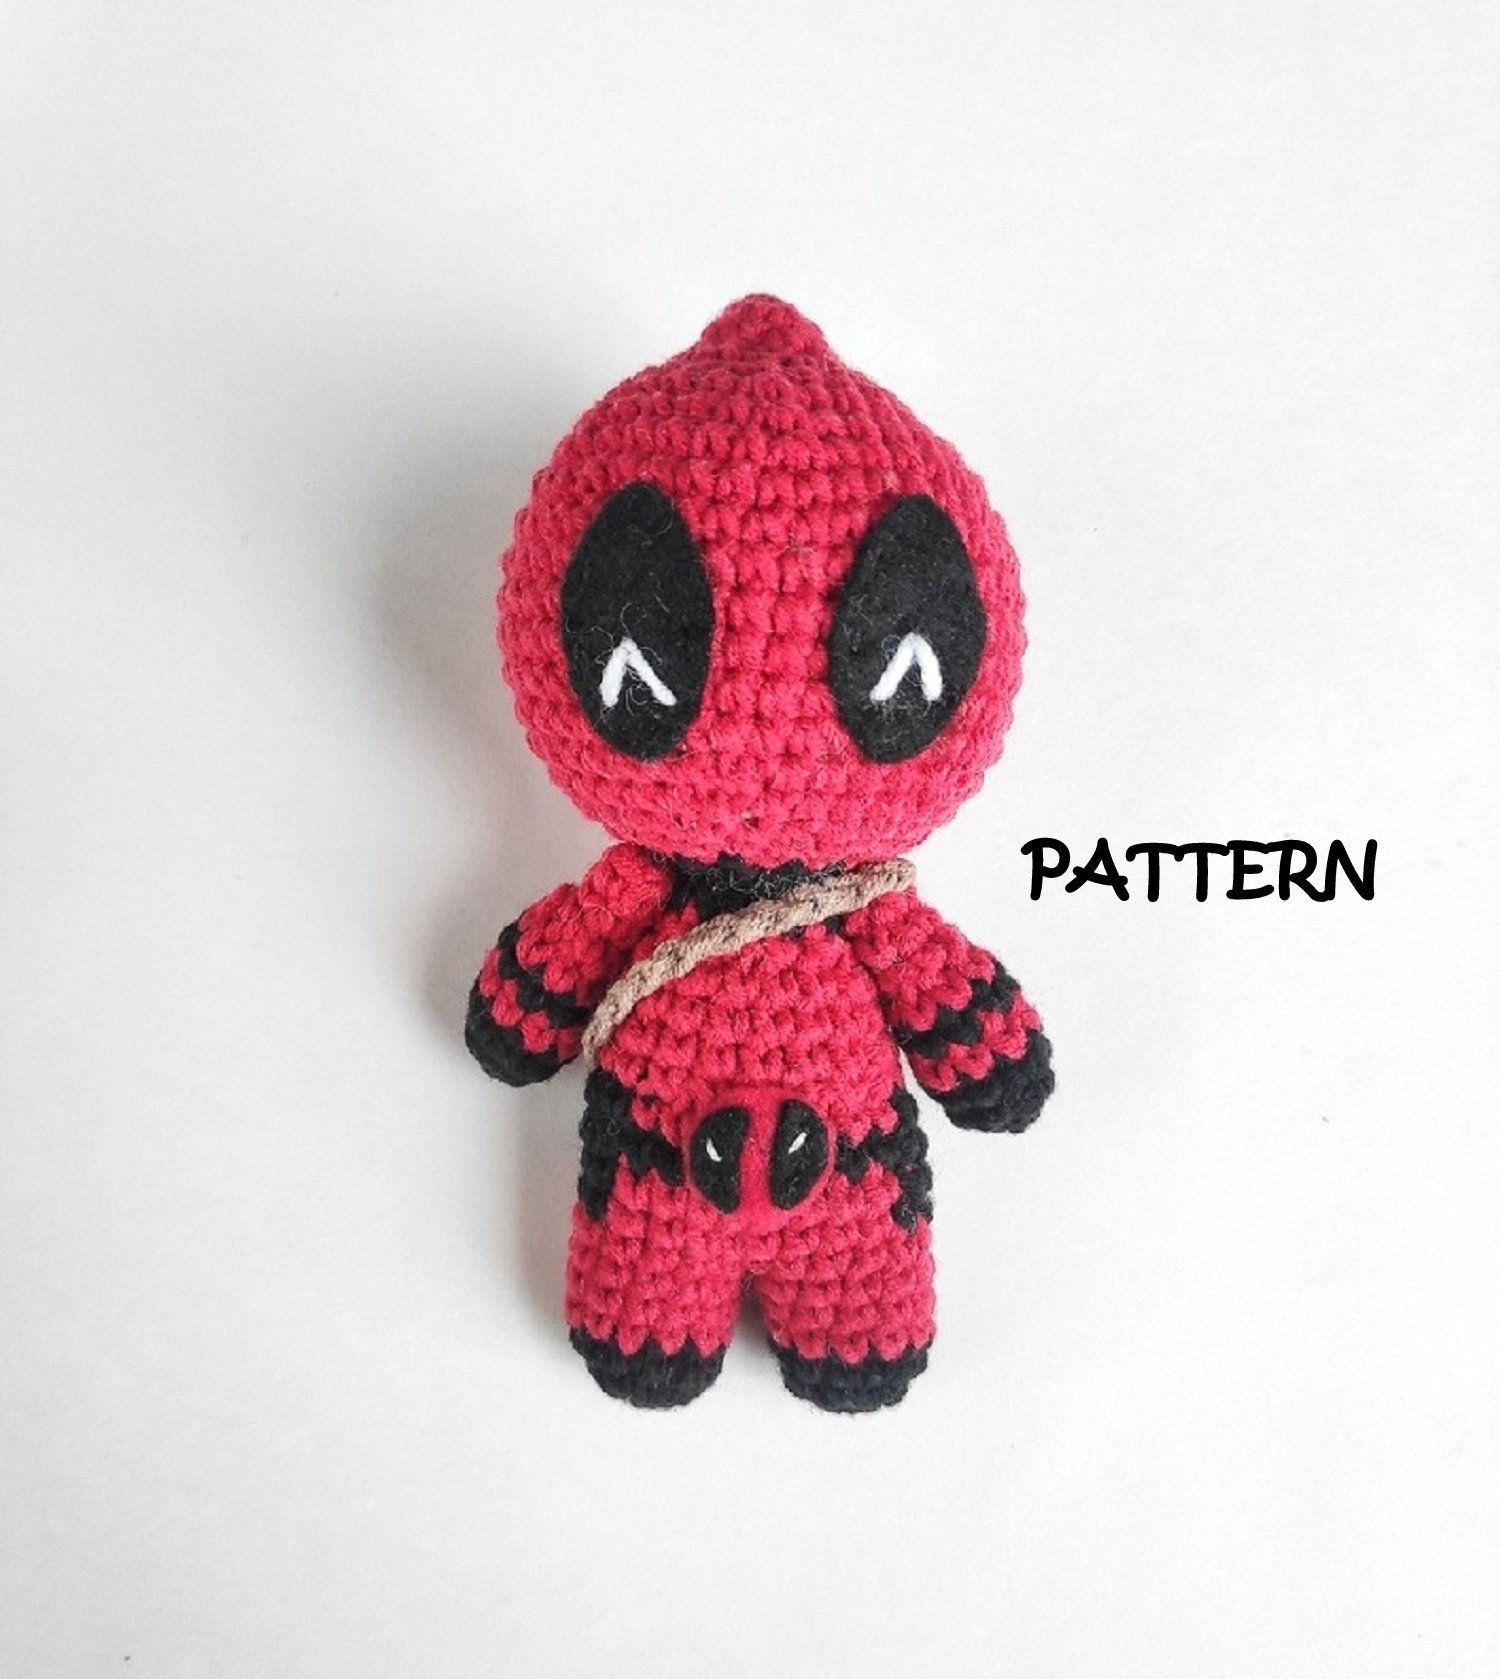 Marvel's Deadpool Doll Amigurumi Crochet Free Pattern | Häkeln ... | 1679x1500